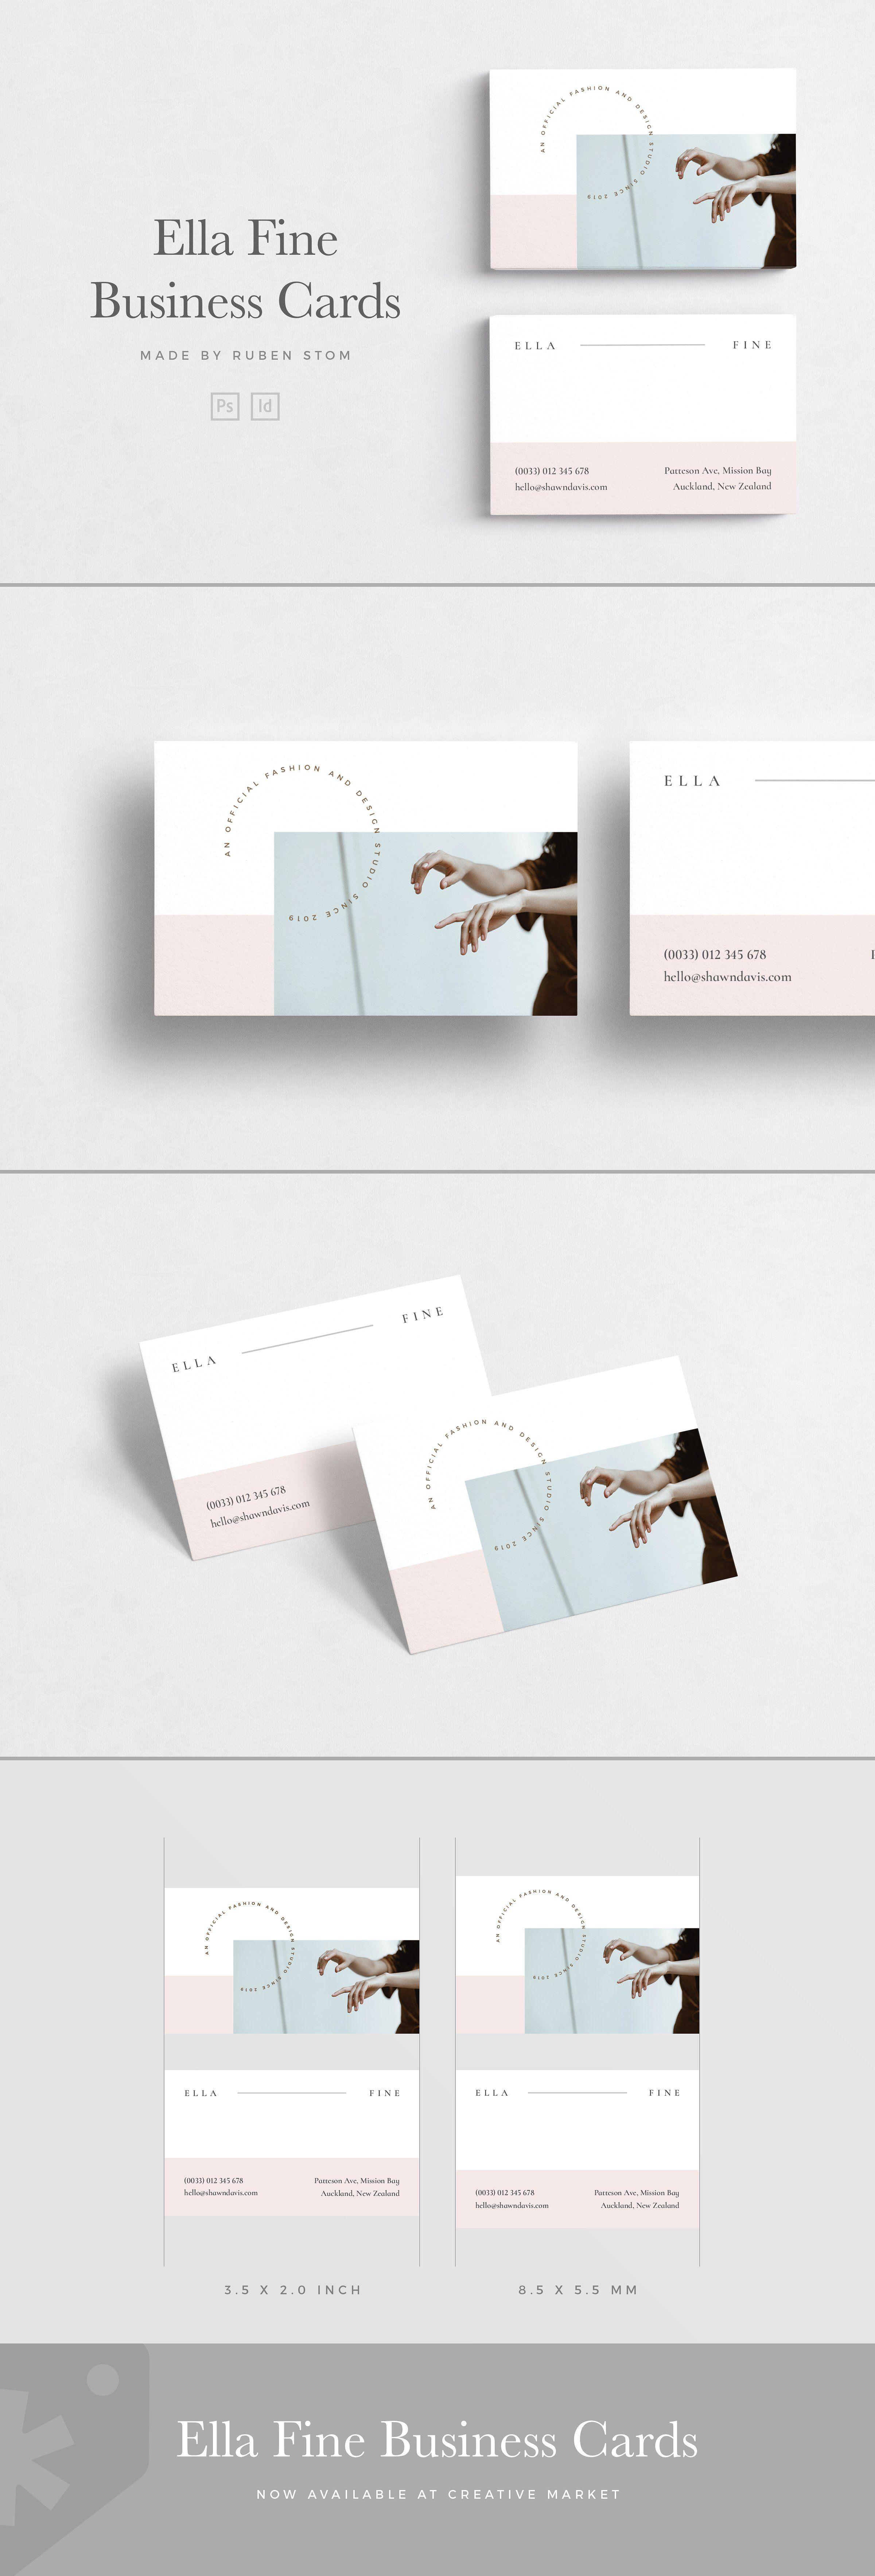 Ella Fine Business Card Elegant Business Cards Business Card Template Indesign Templates